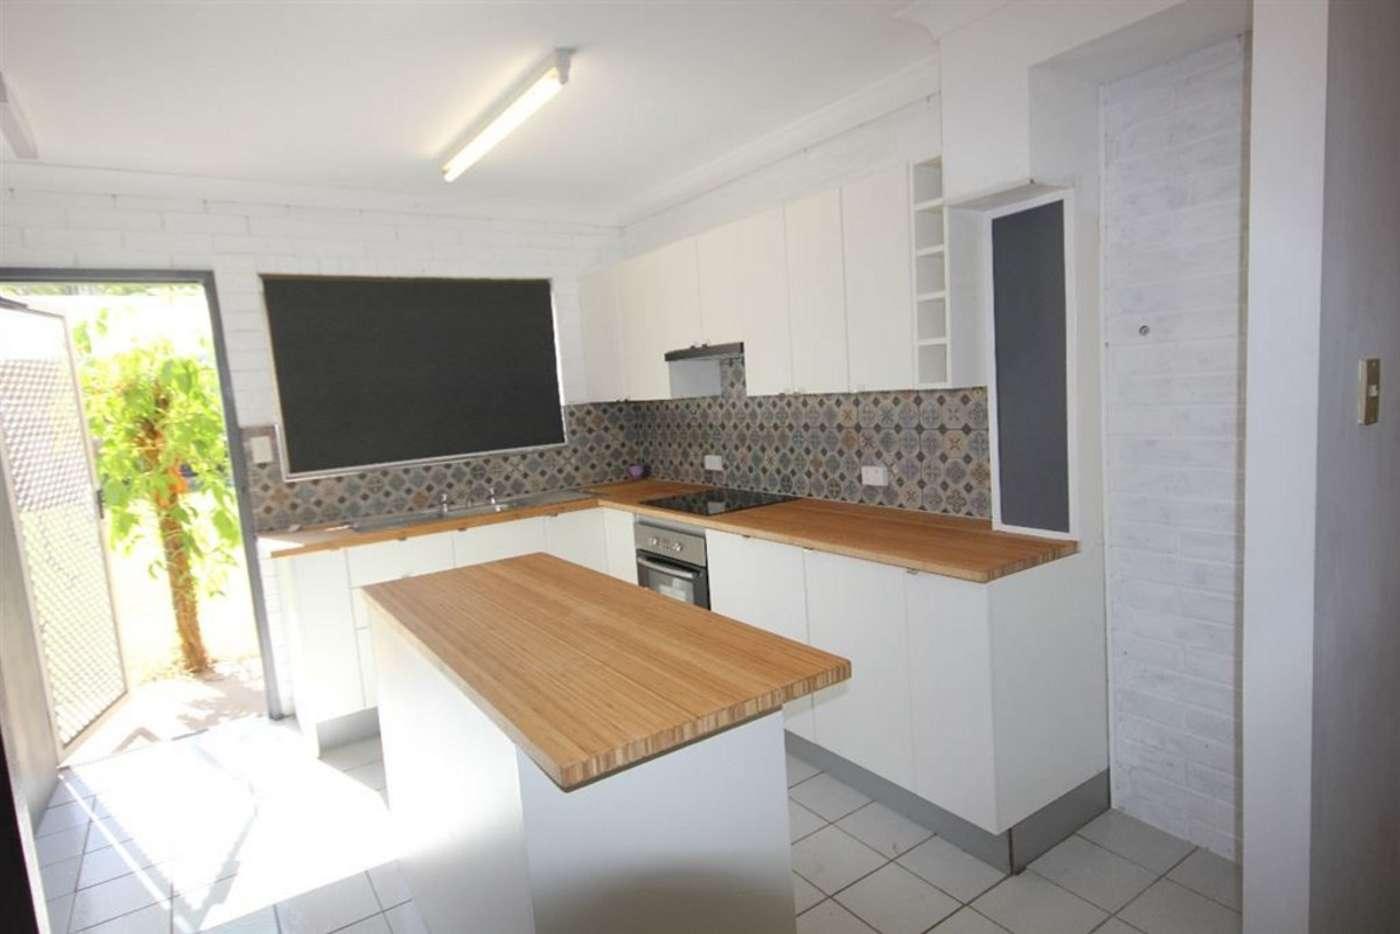 Main view of Homely unit listing, 5/6 Taranganba Road, Taranganba QLD 4703